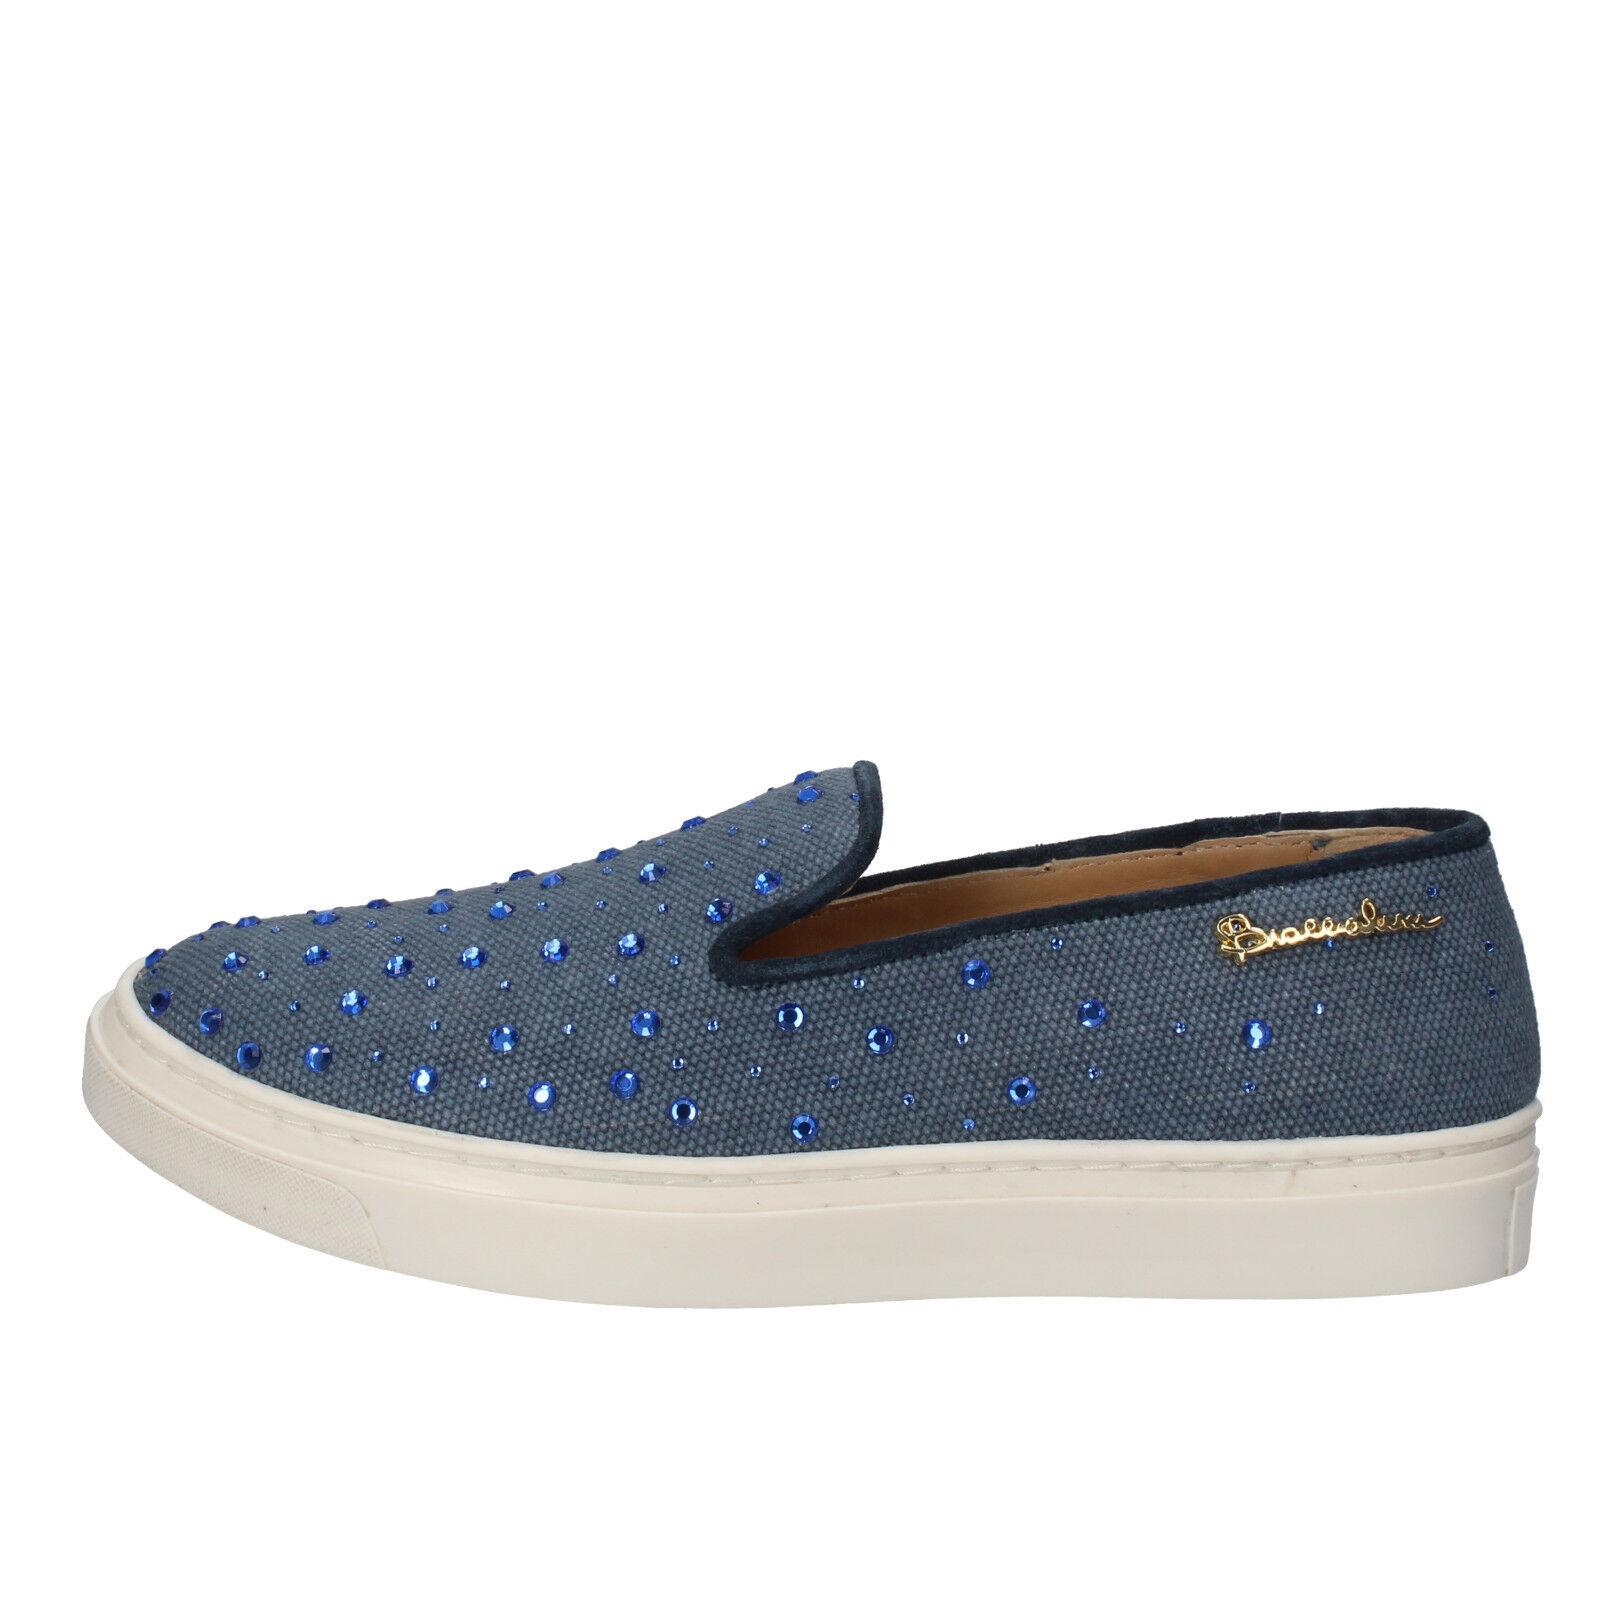 donna scarpe BRACIALINI 4 (UE 37) pani tessili azzurri senza strass AE540 -B